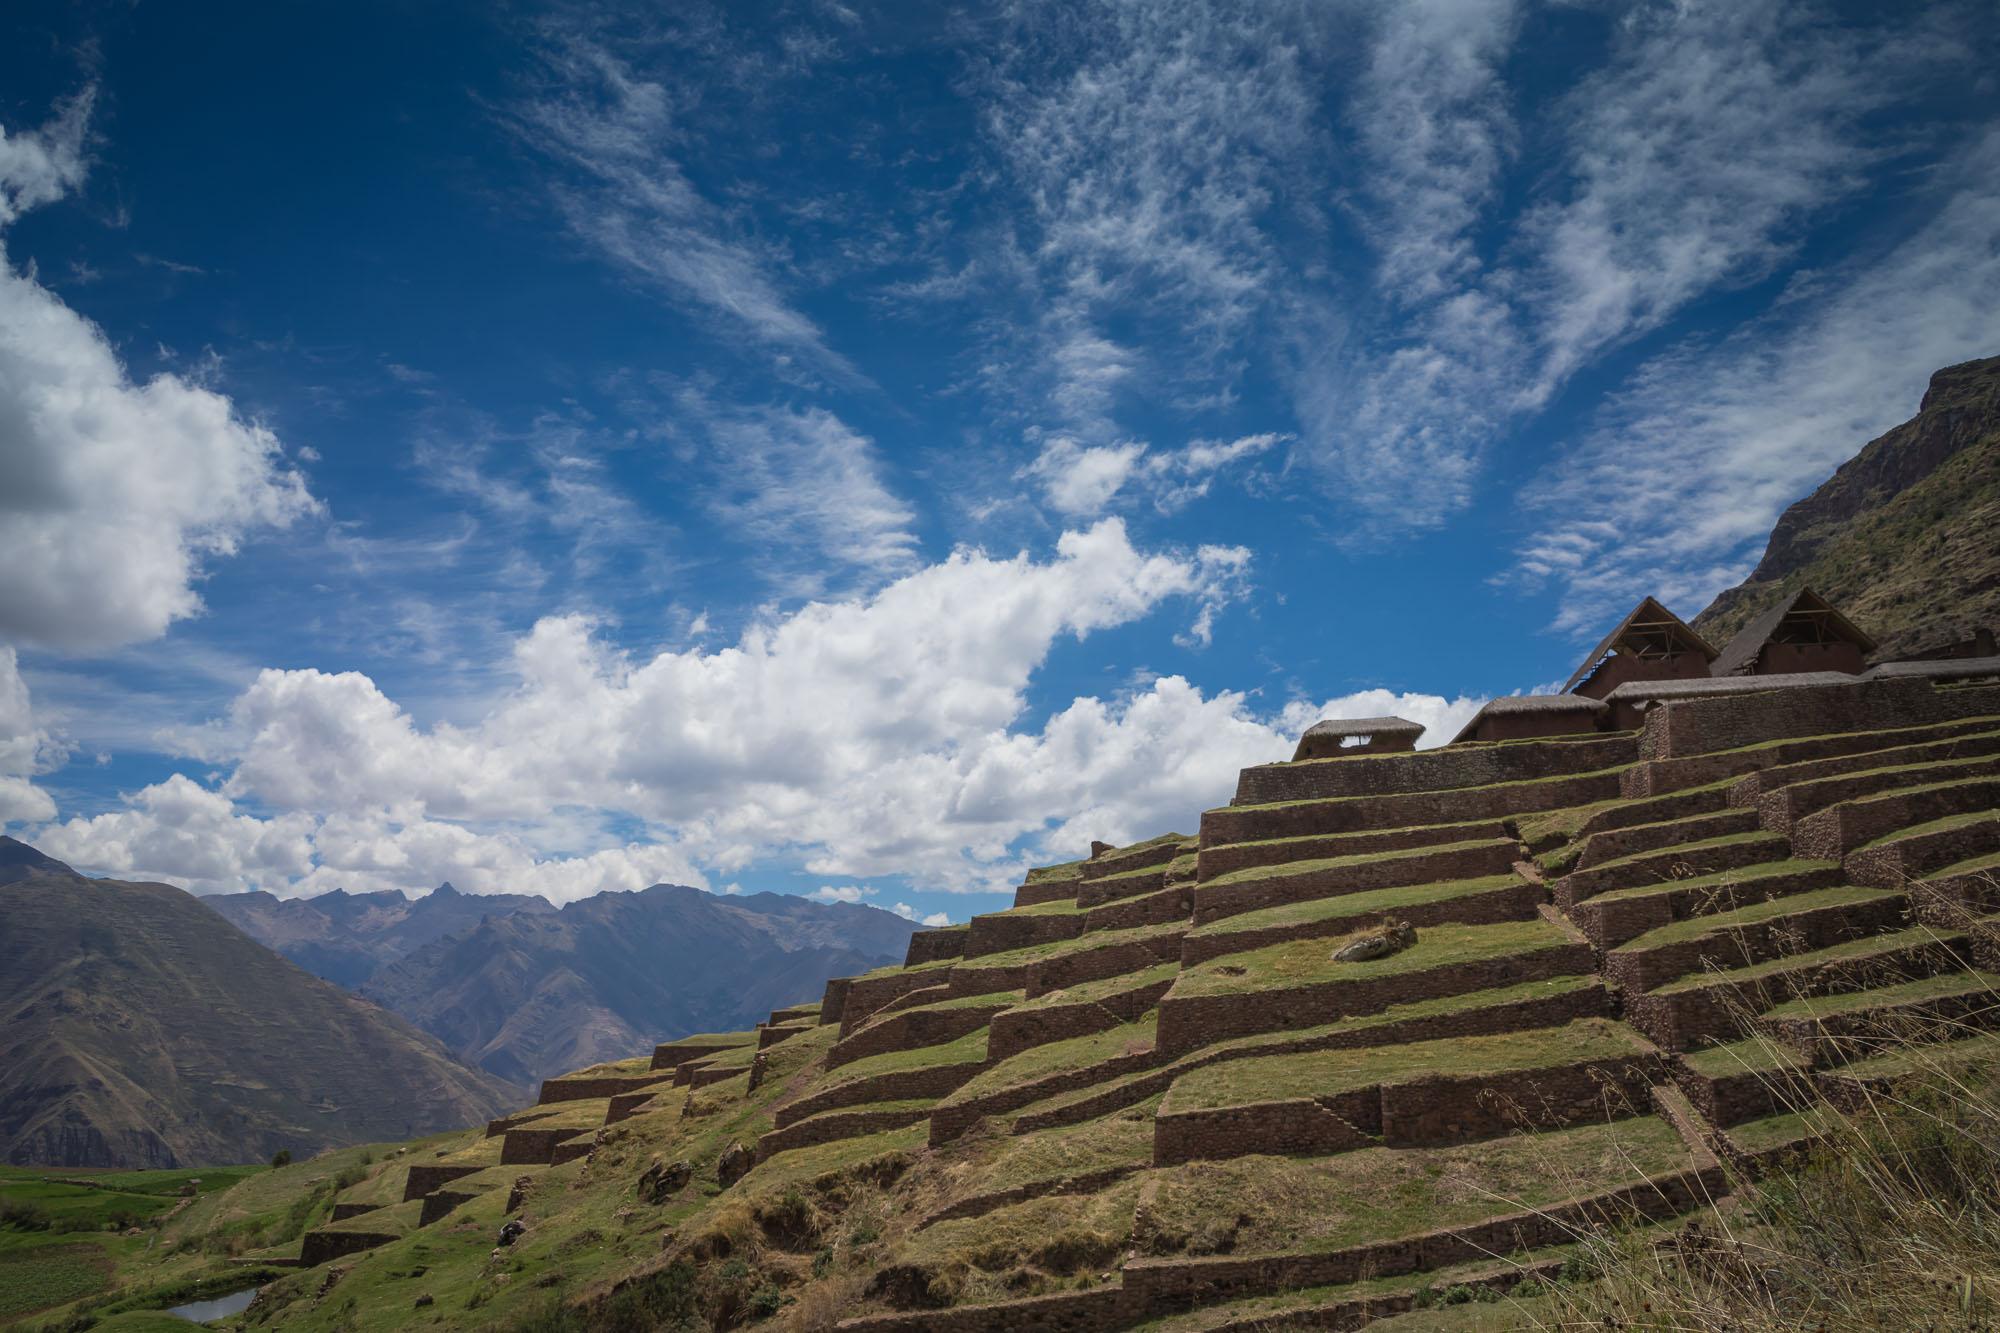 3 day Huchuy Qosqo and Machu Picchu hiking holiday in Peru